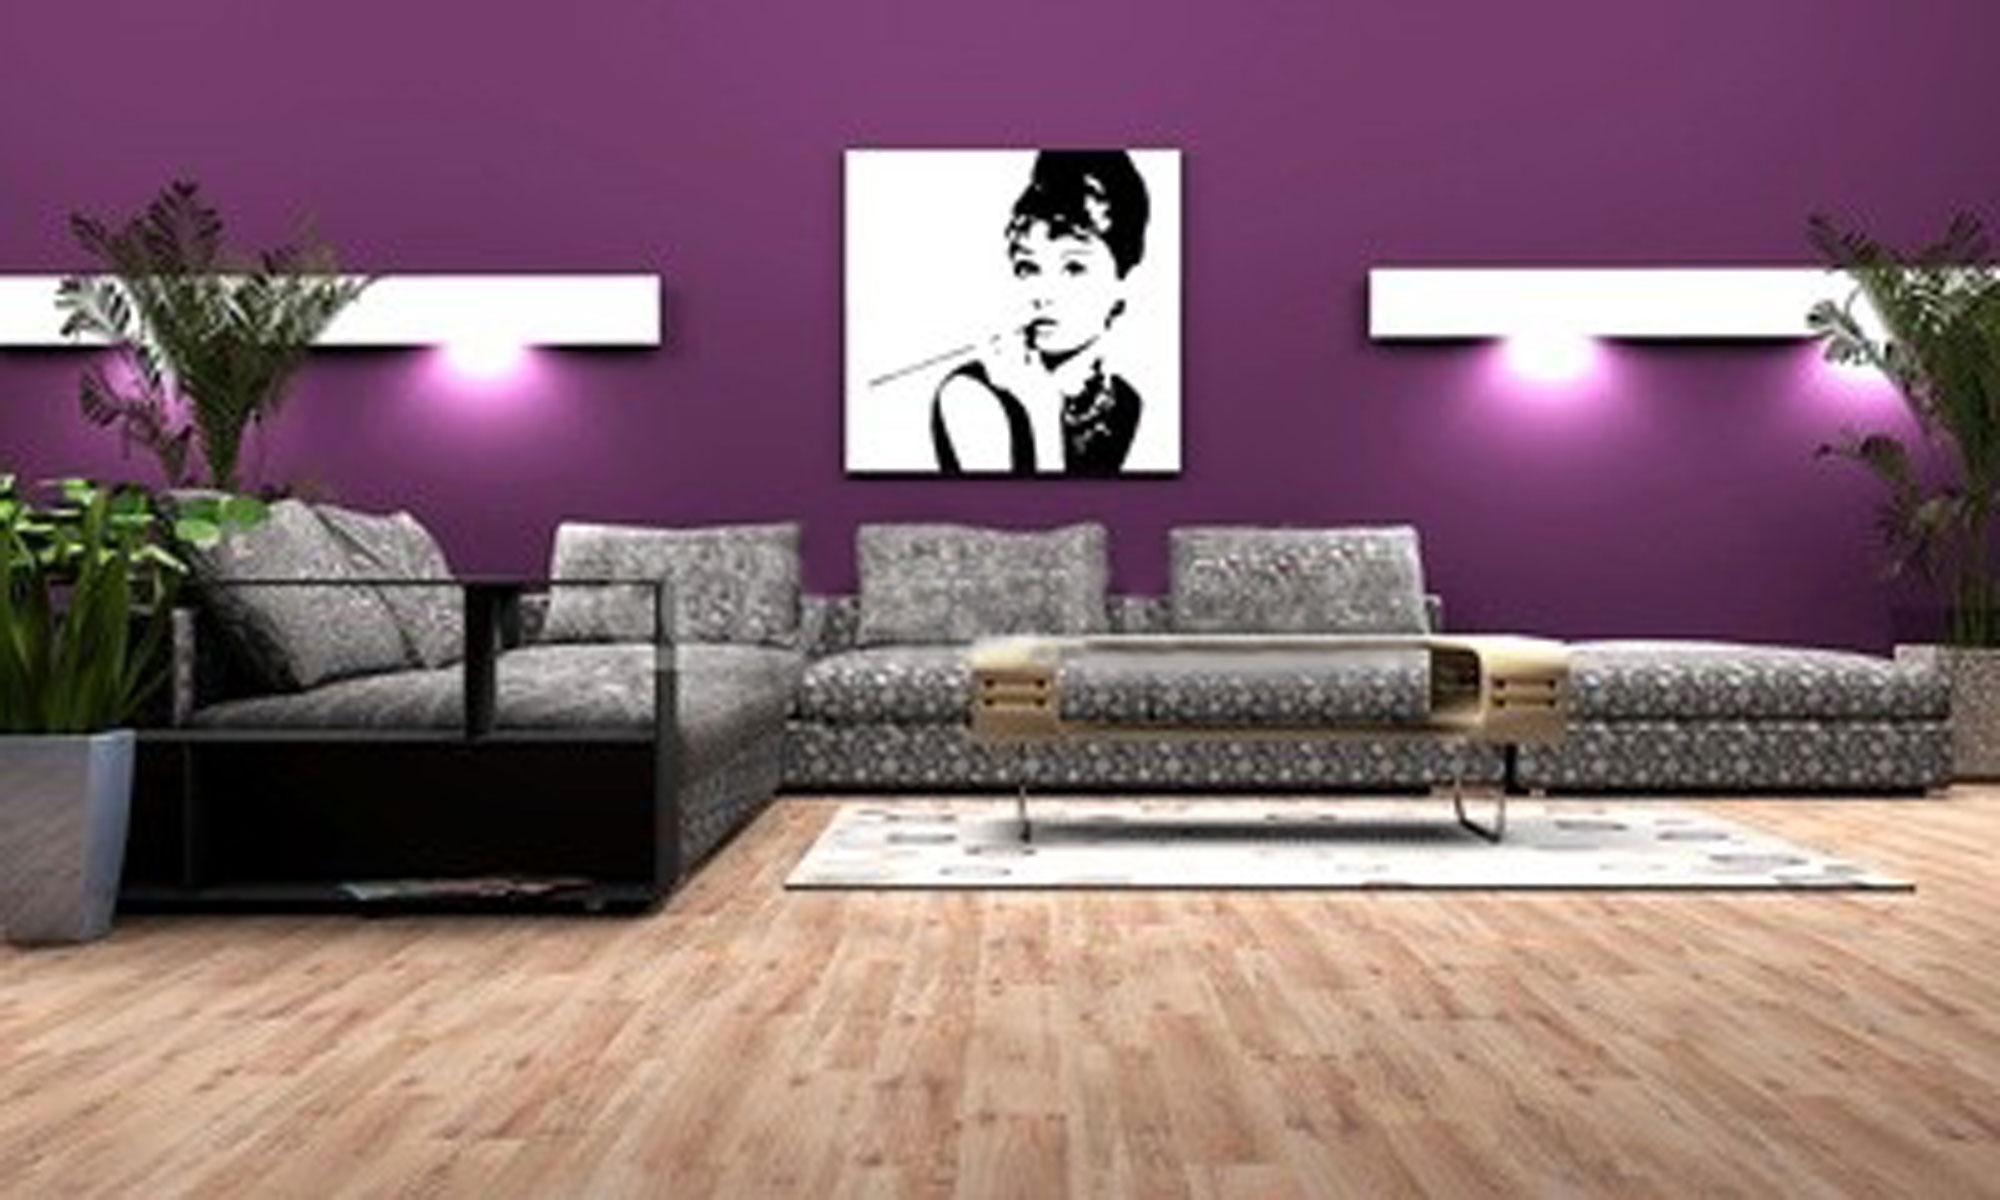 Déco : peinture mode demploi! - Astuces Bricolage